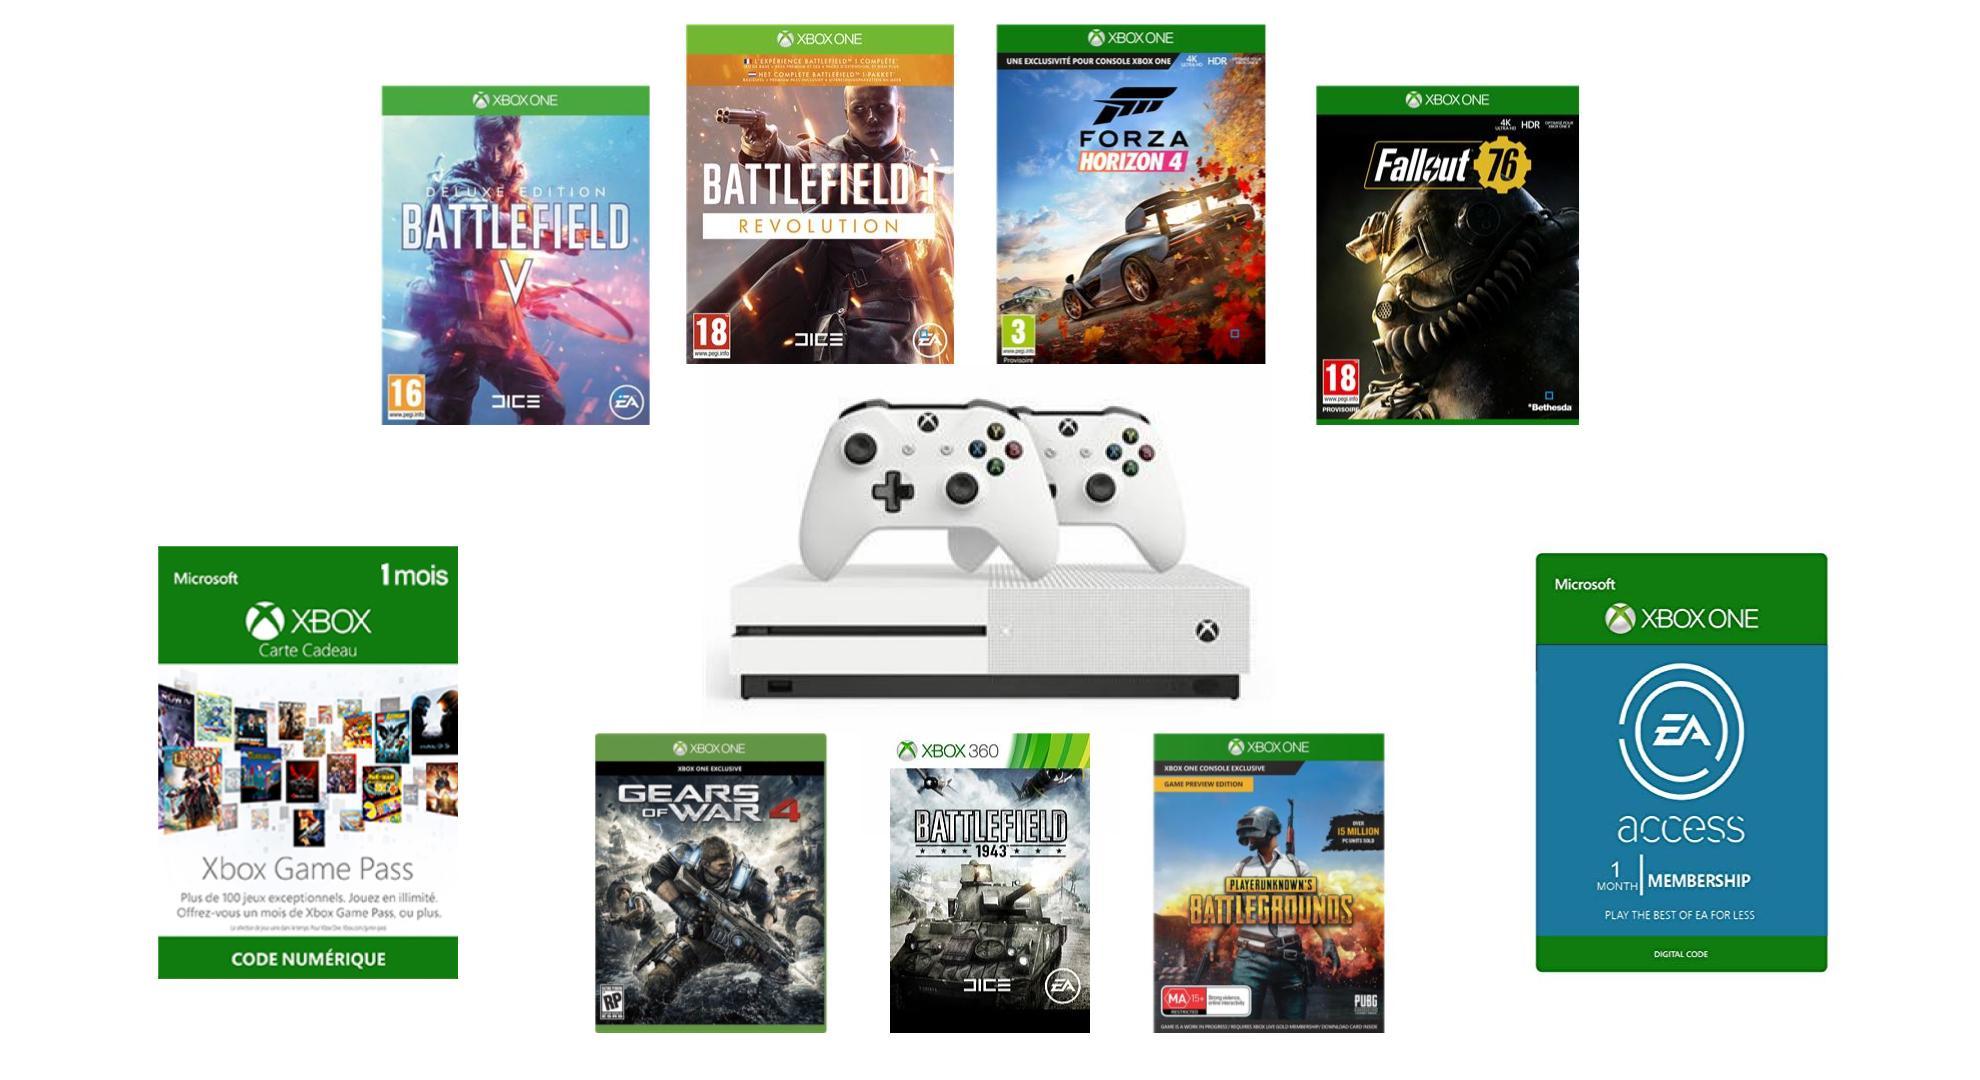 Bon Plan Mega Pack Xbox One S 1 To 2 Manettes 7 Jeux A 249